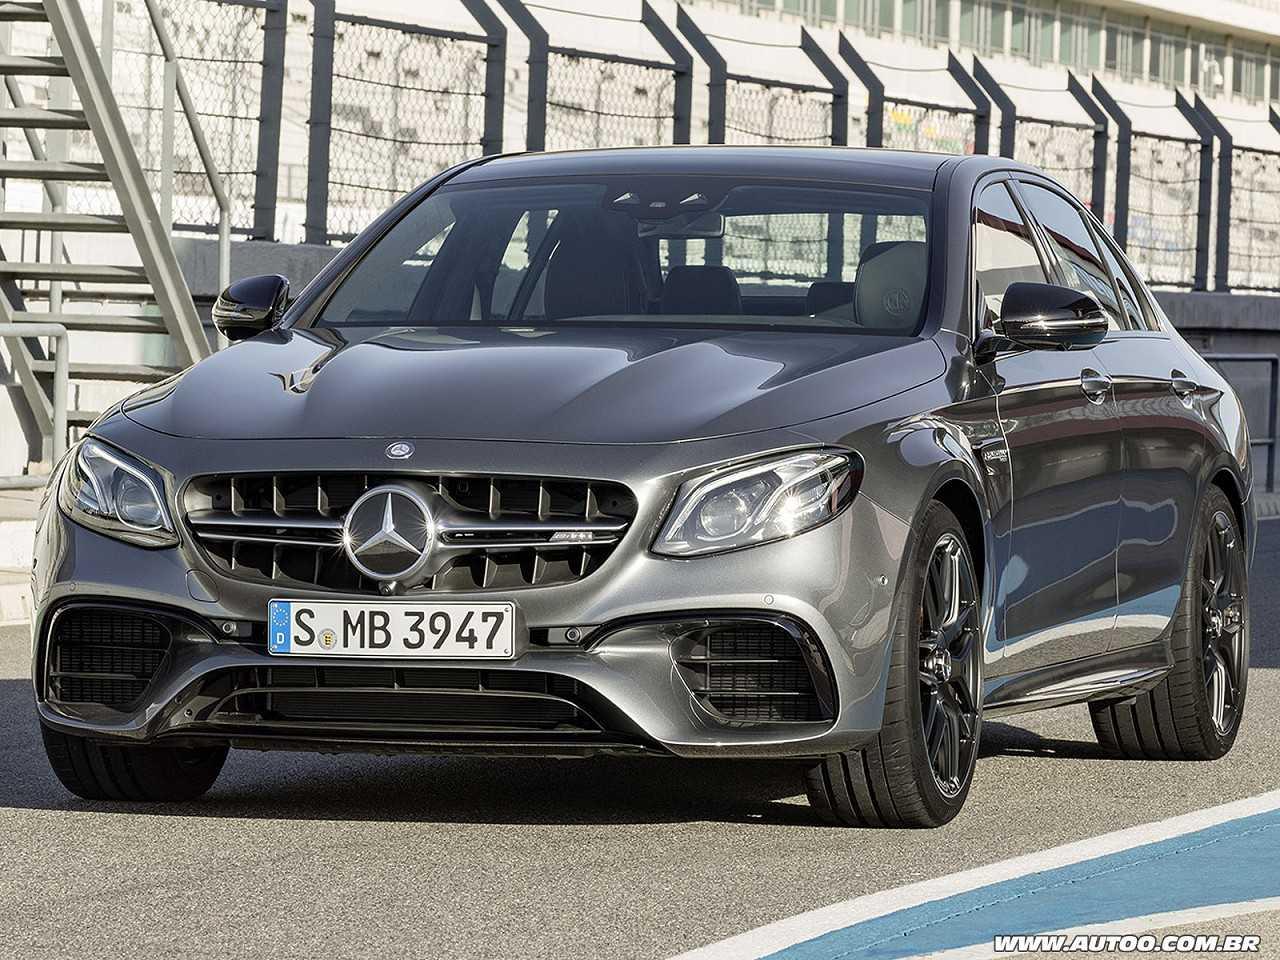 Mercedes-AMG E 63 S 4Matic